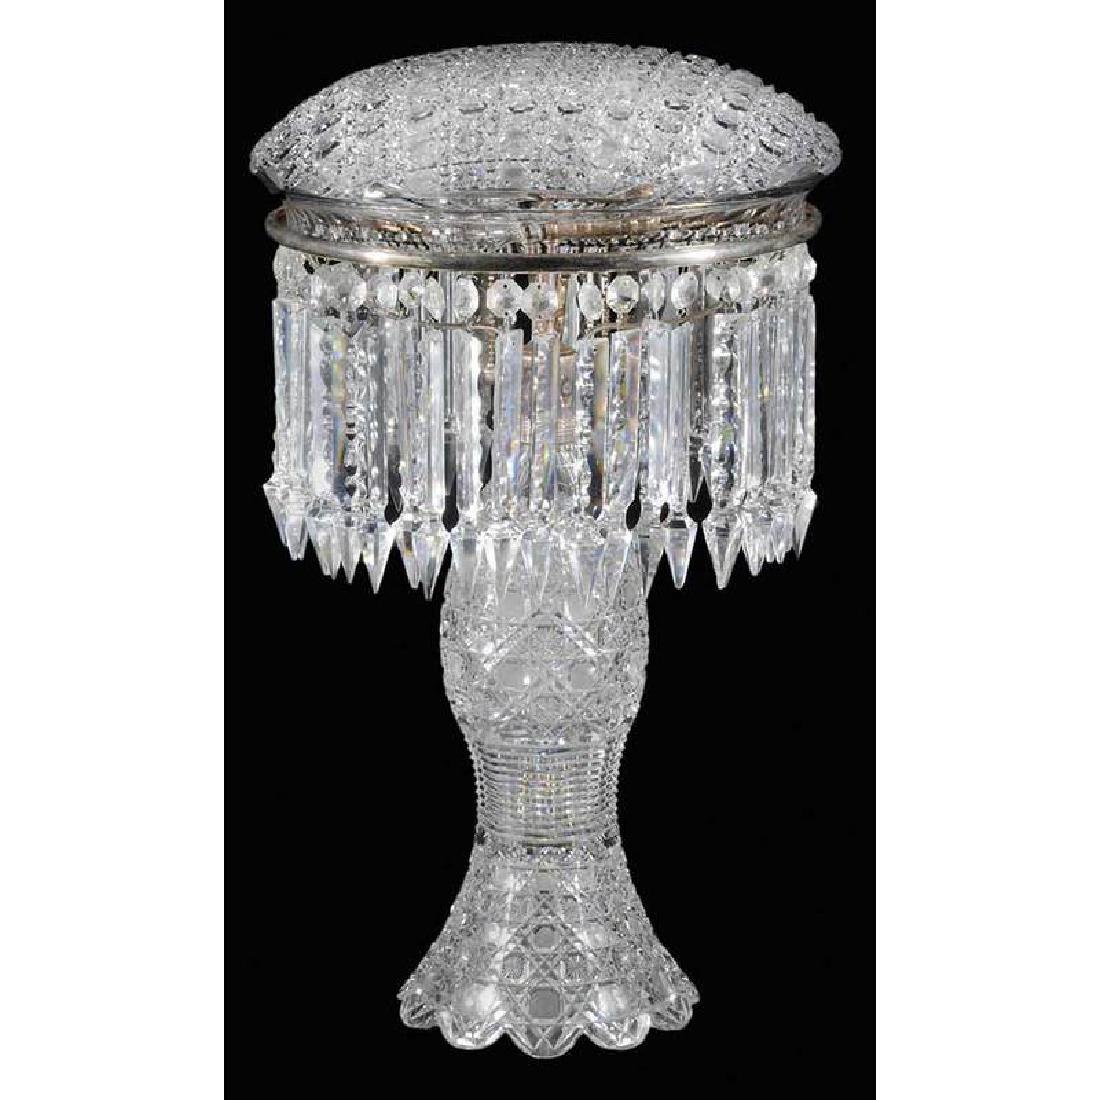 Brilliant Period Cut Glass Table Lamp